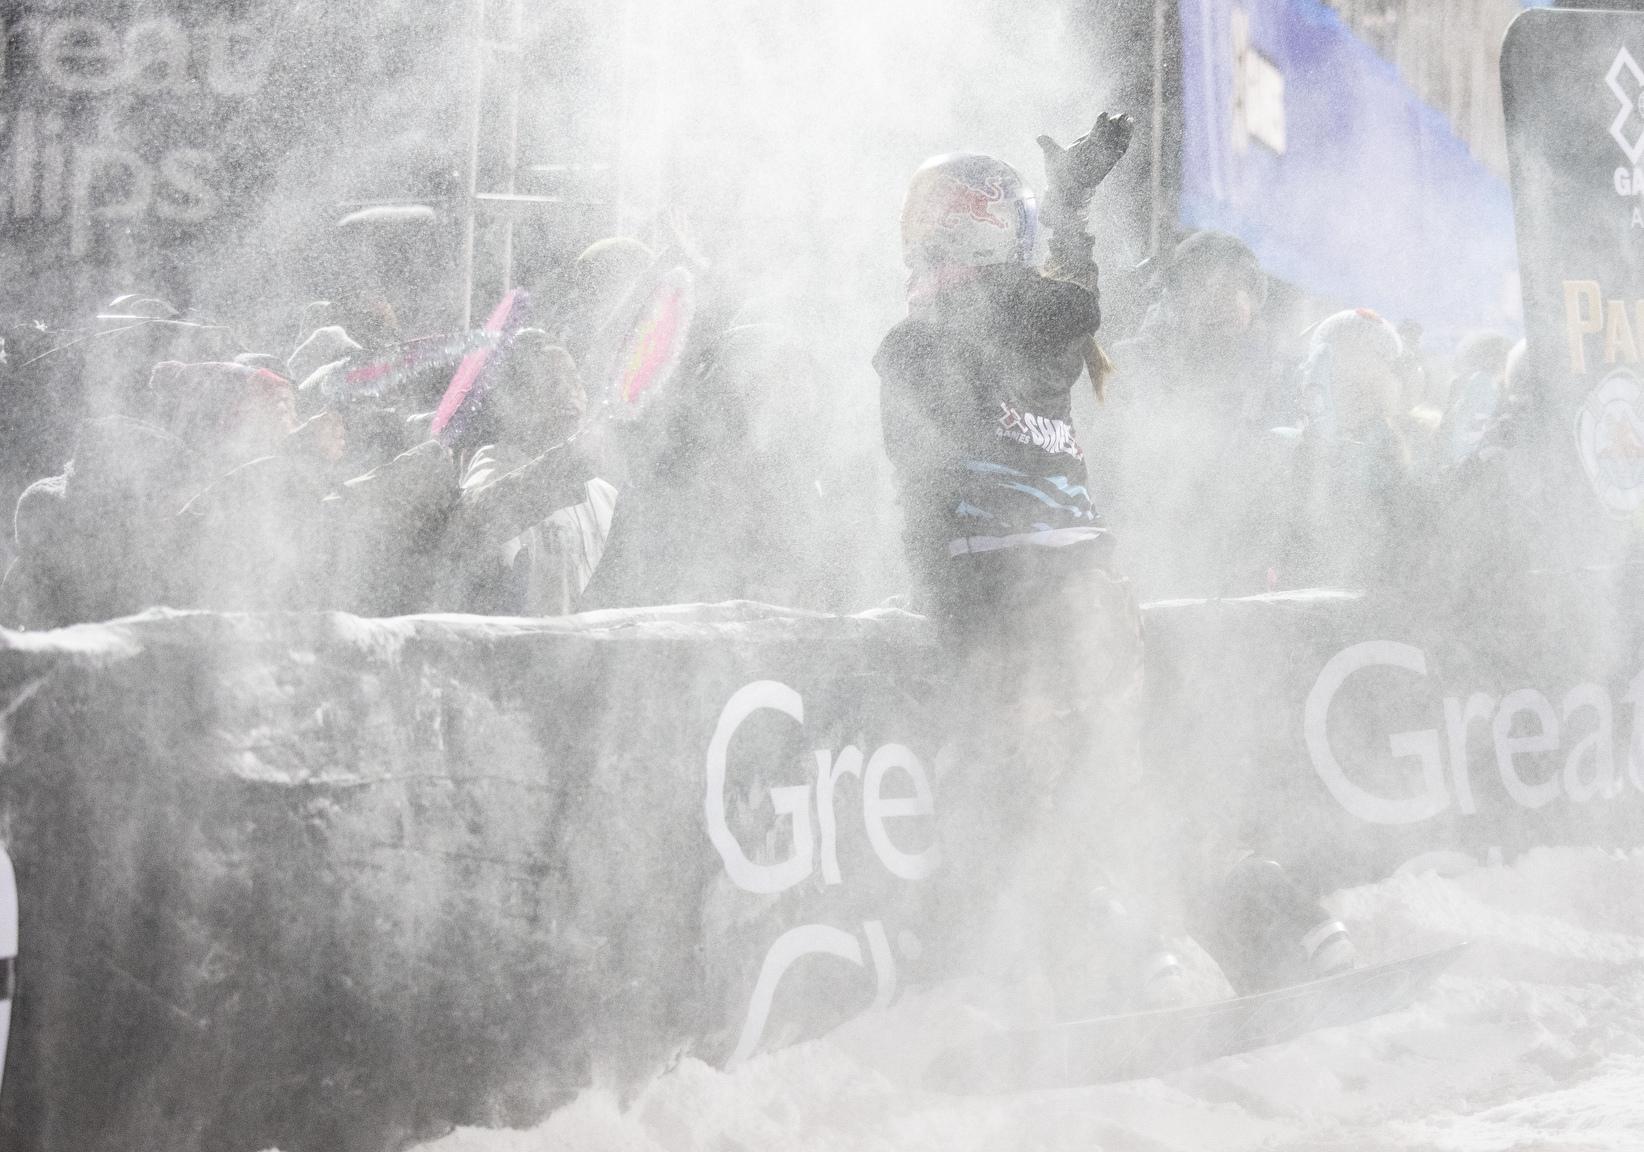 Miyabi Onitsuka, W Snowboard Big Air